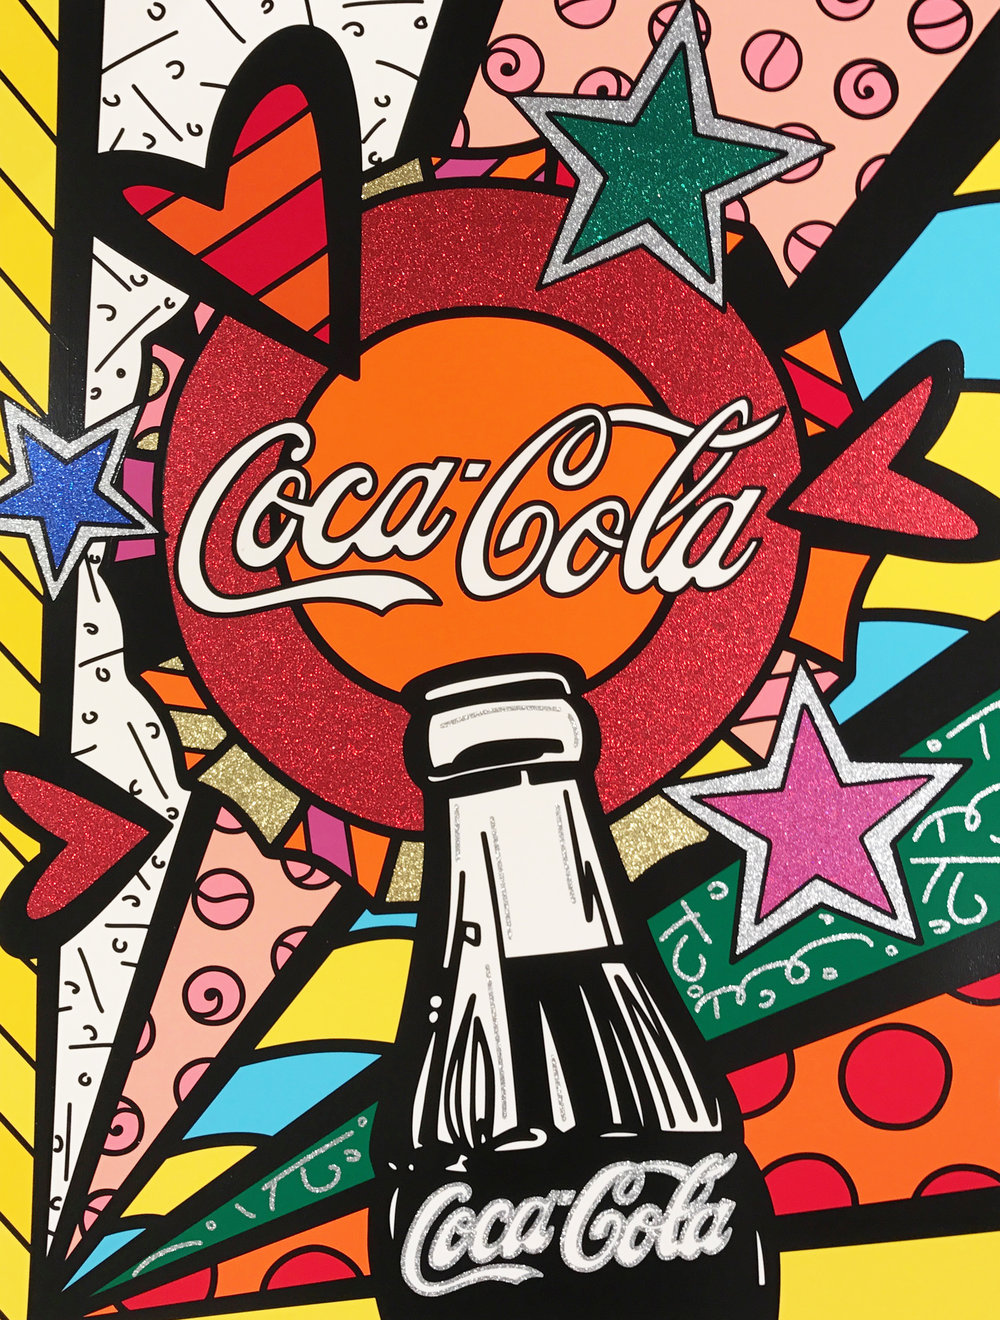 """Coca Cola III – Sunshine"" Serigraph,Limited edition, No. 10 of 100 101.6 x 76.2 cm 2016"